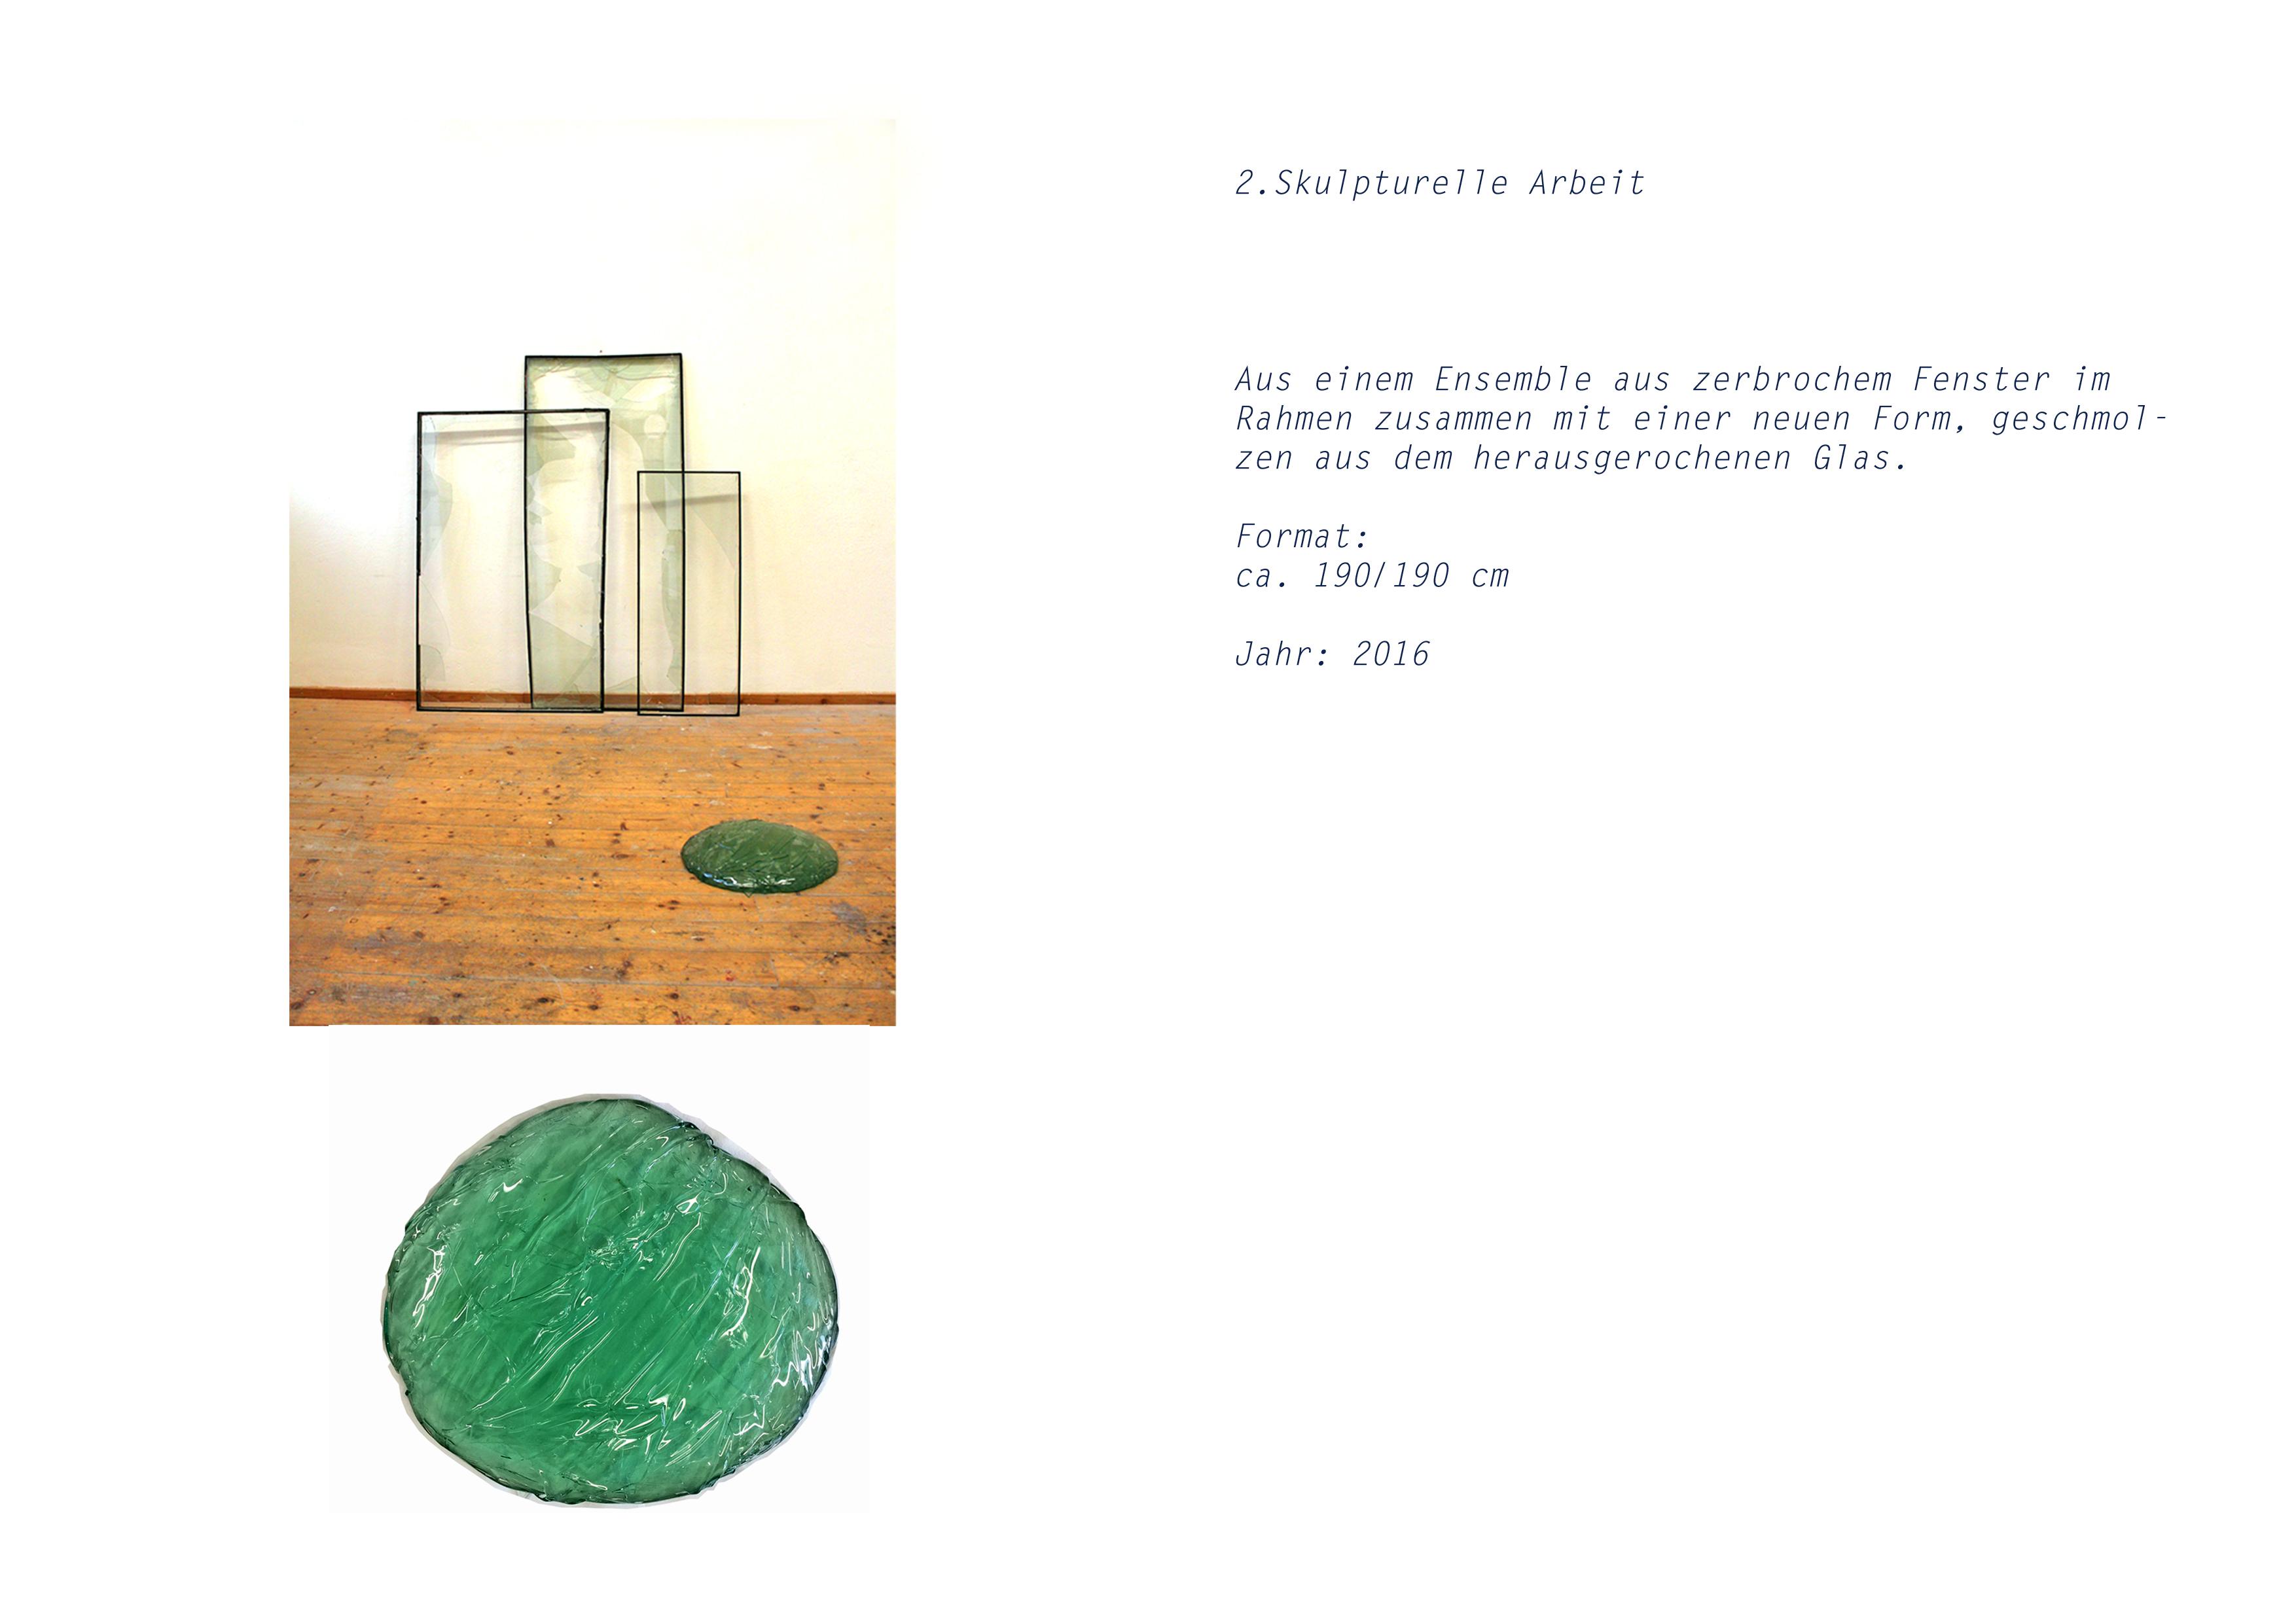 7-Skulptural-arbeit-tropf